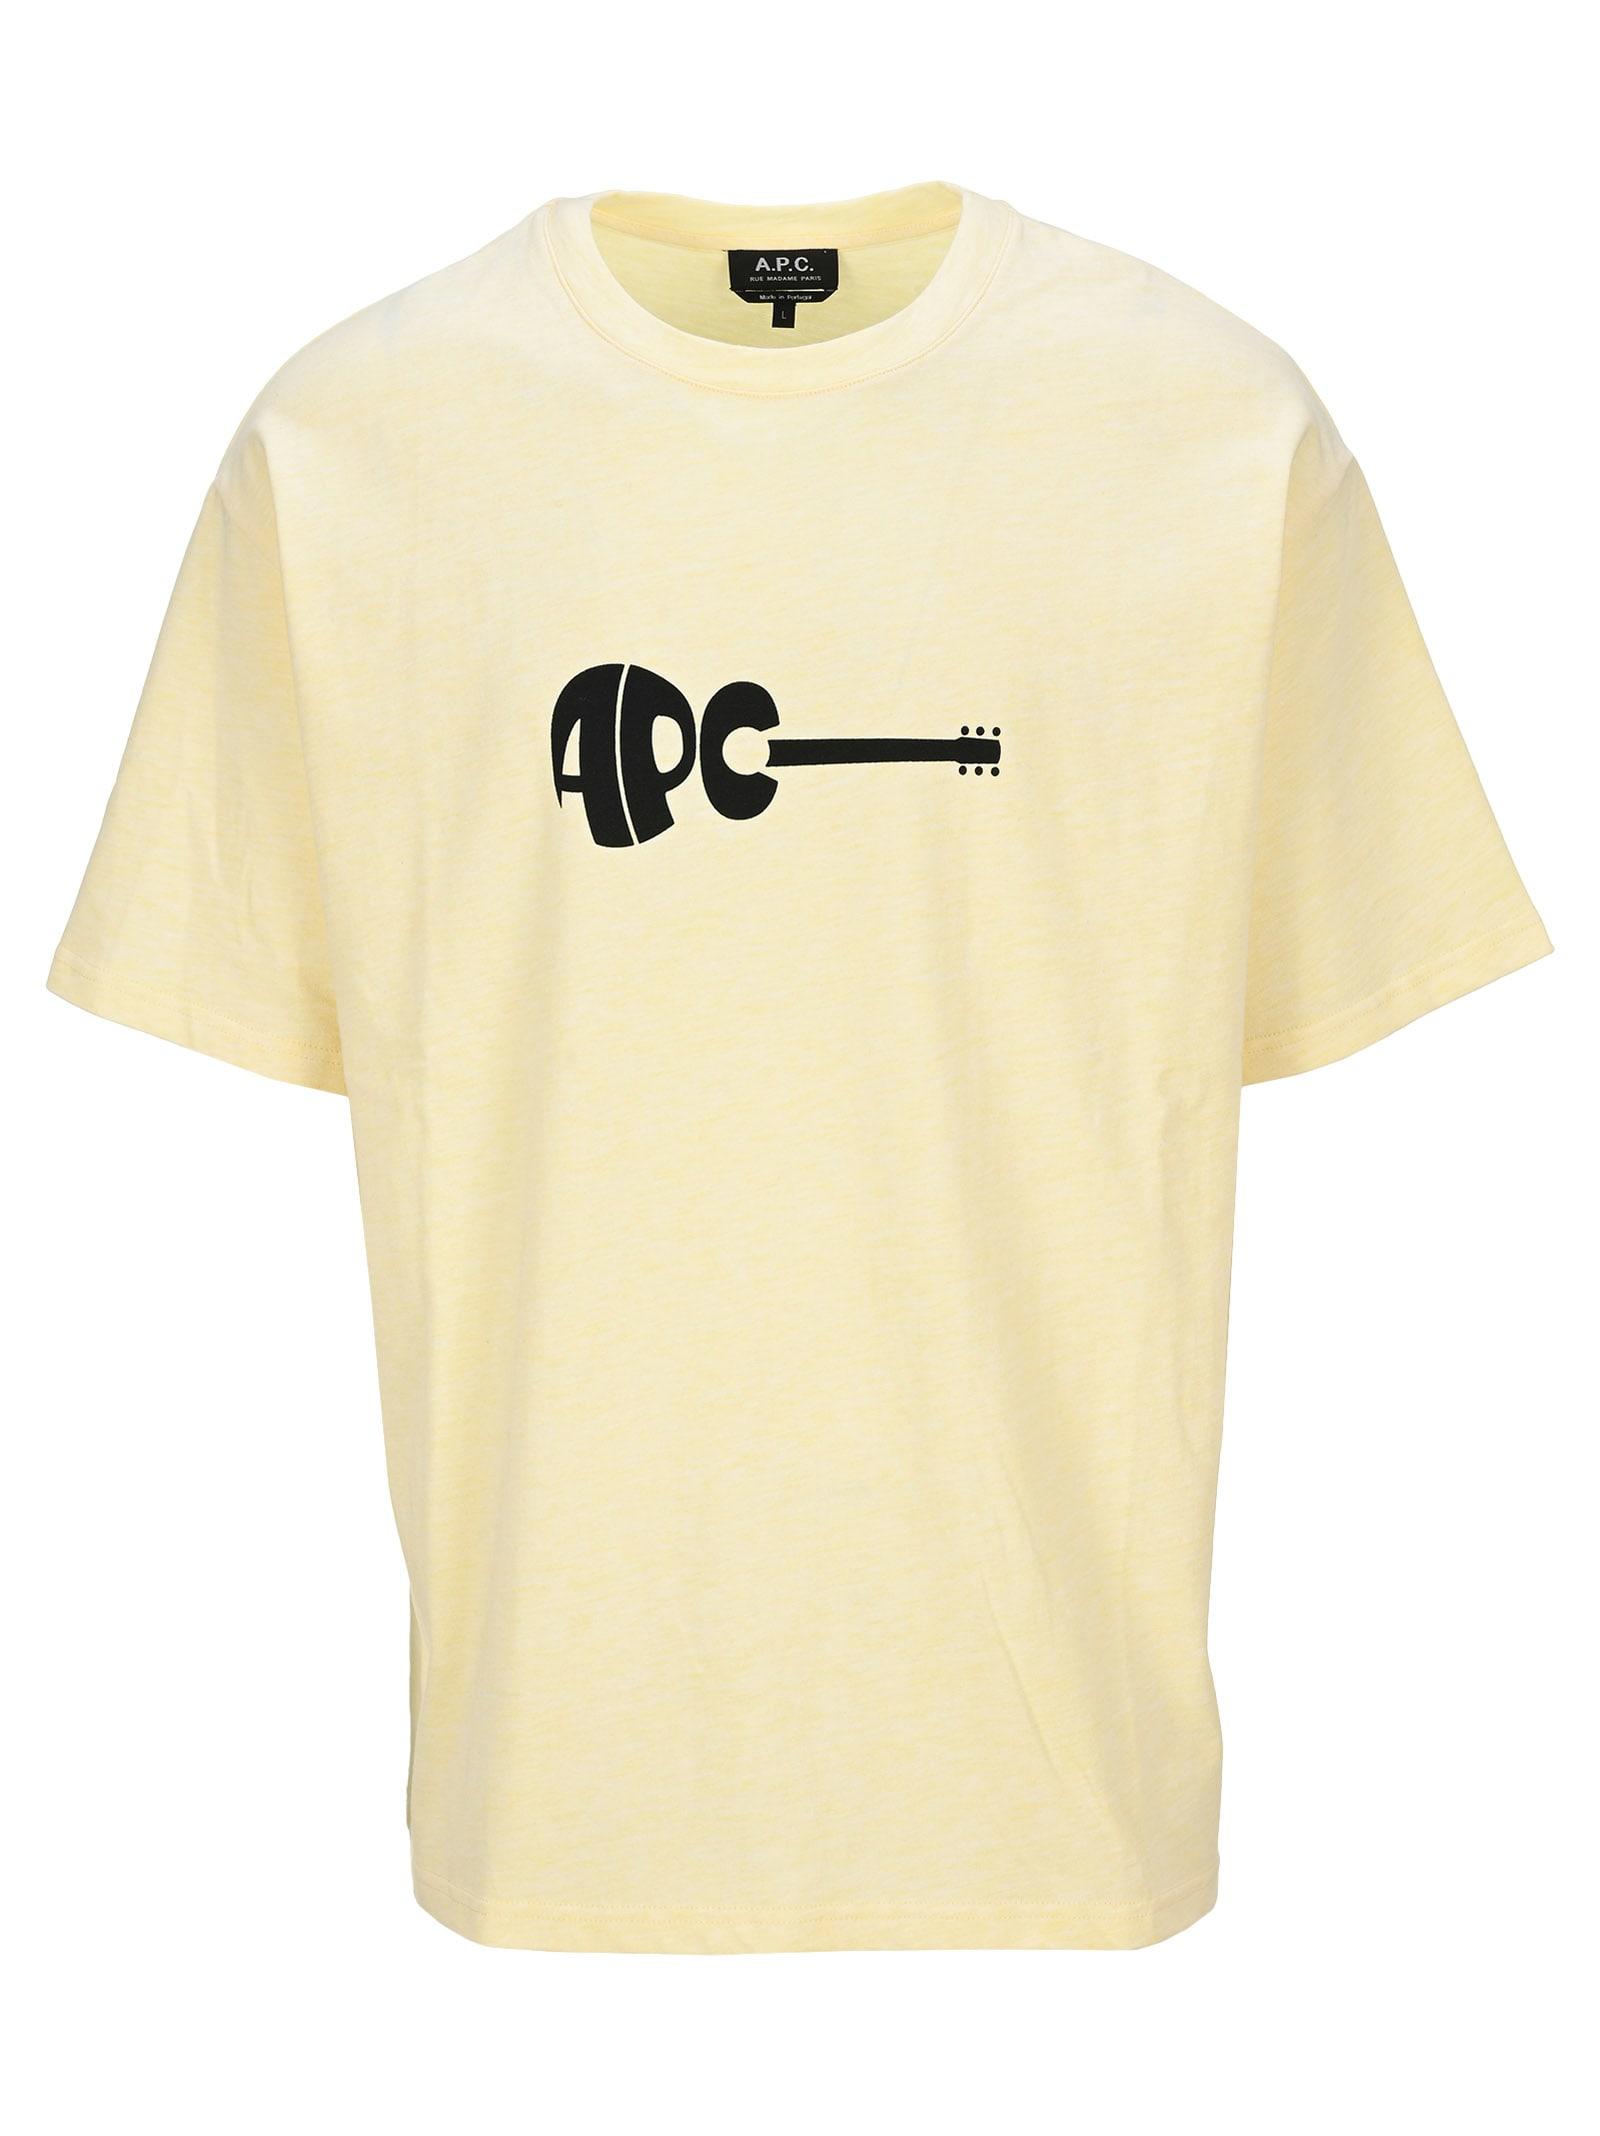 A.p.c. Guitar T-shirt In Yellow Ocra